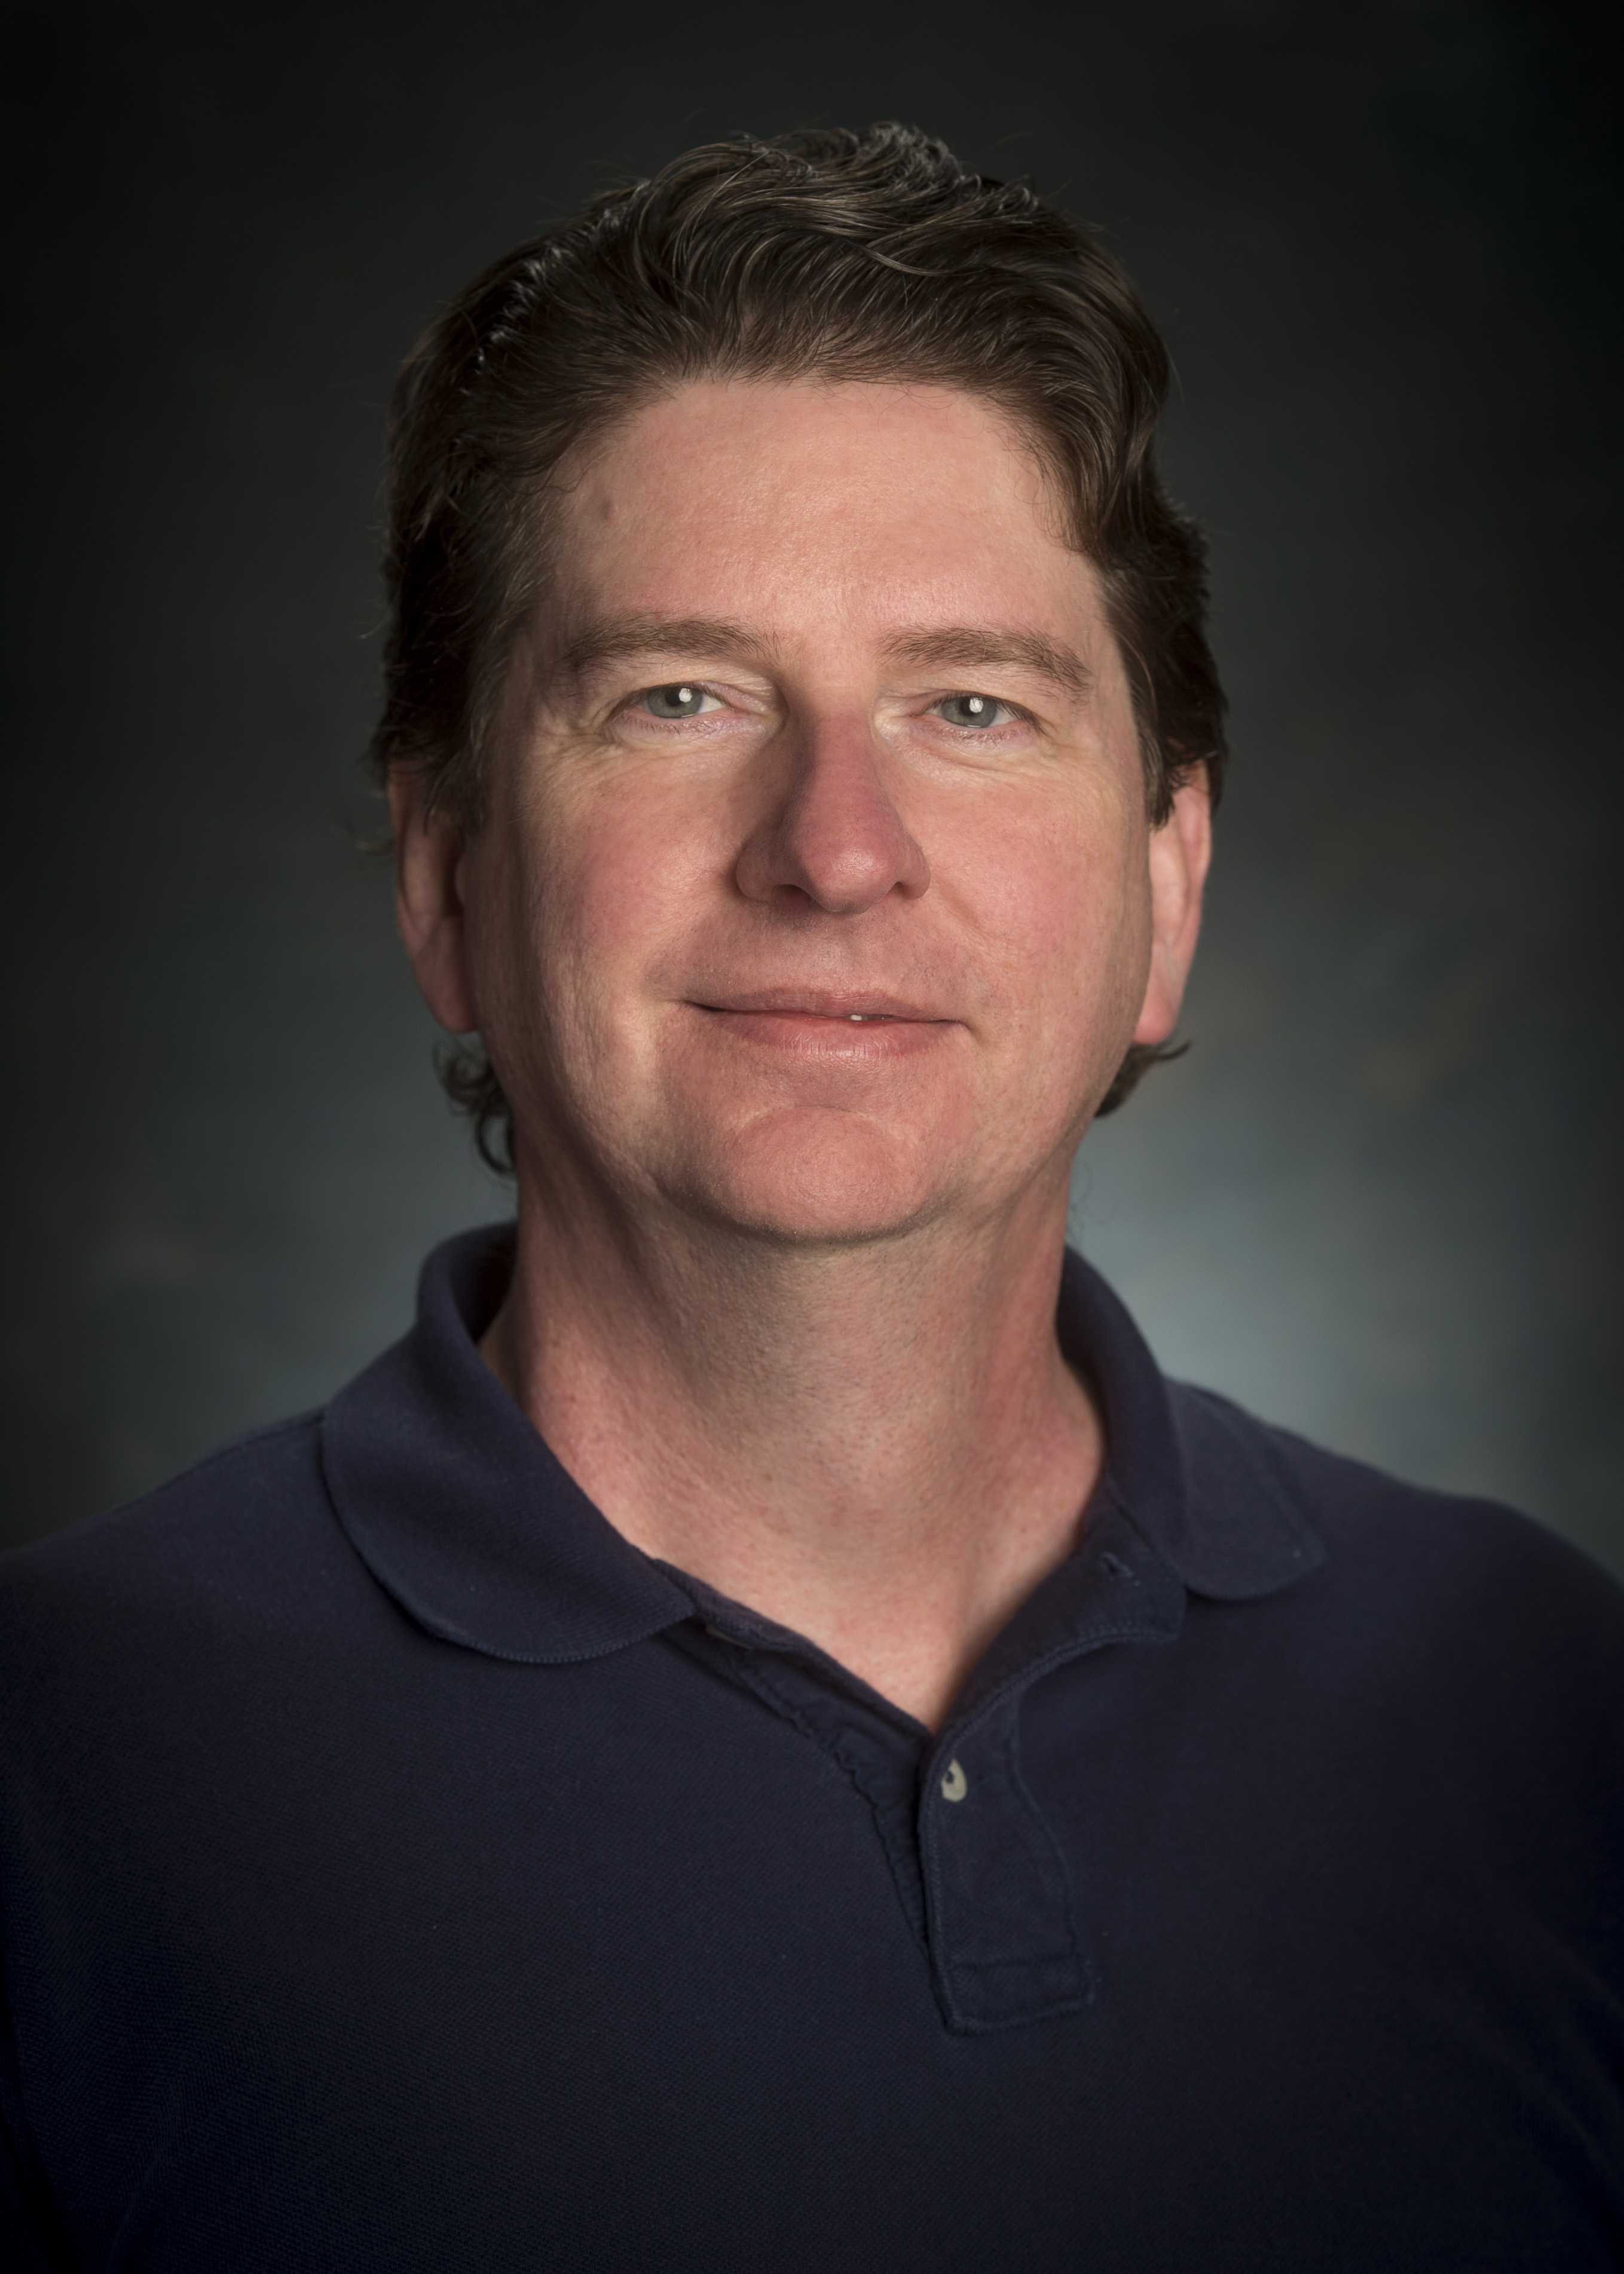 Head shot of Dr. David Sweatt, PhD (Chairman and Endowed Professor, Neurobiology), 2015.